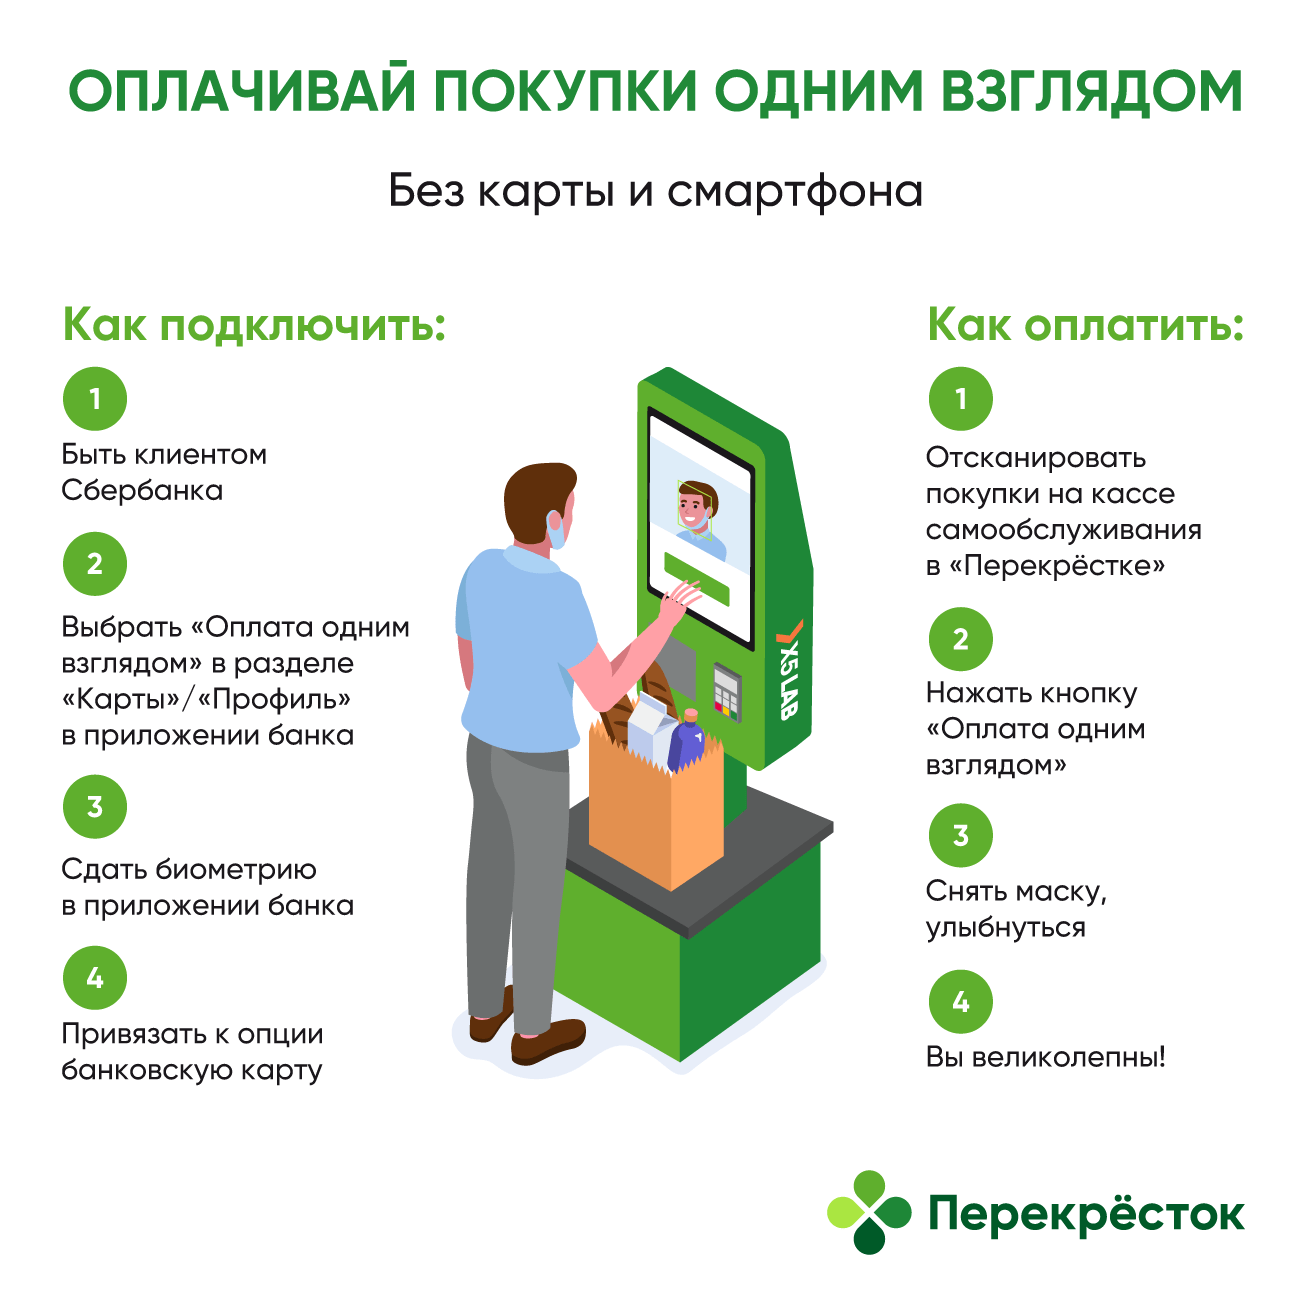 X5 Retail Group, Сбер и Visa запускают оплату взглядом в «Перекрёстке» и «Пятёрочке» (oplata vzglyadom infografika)